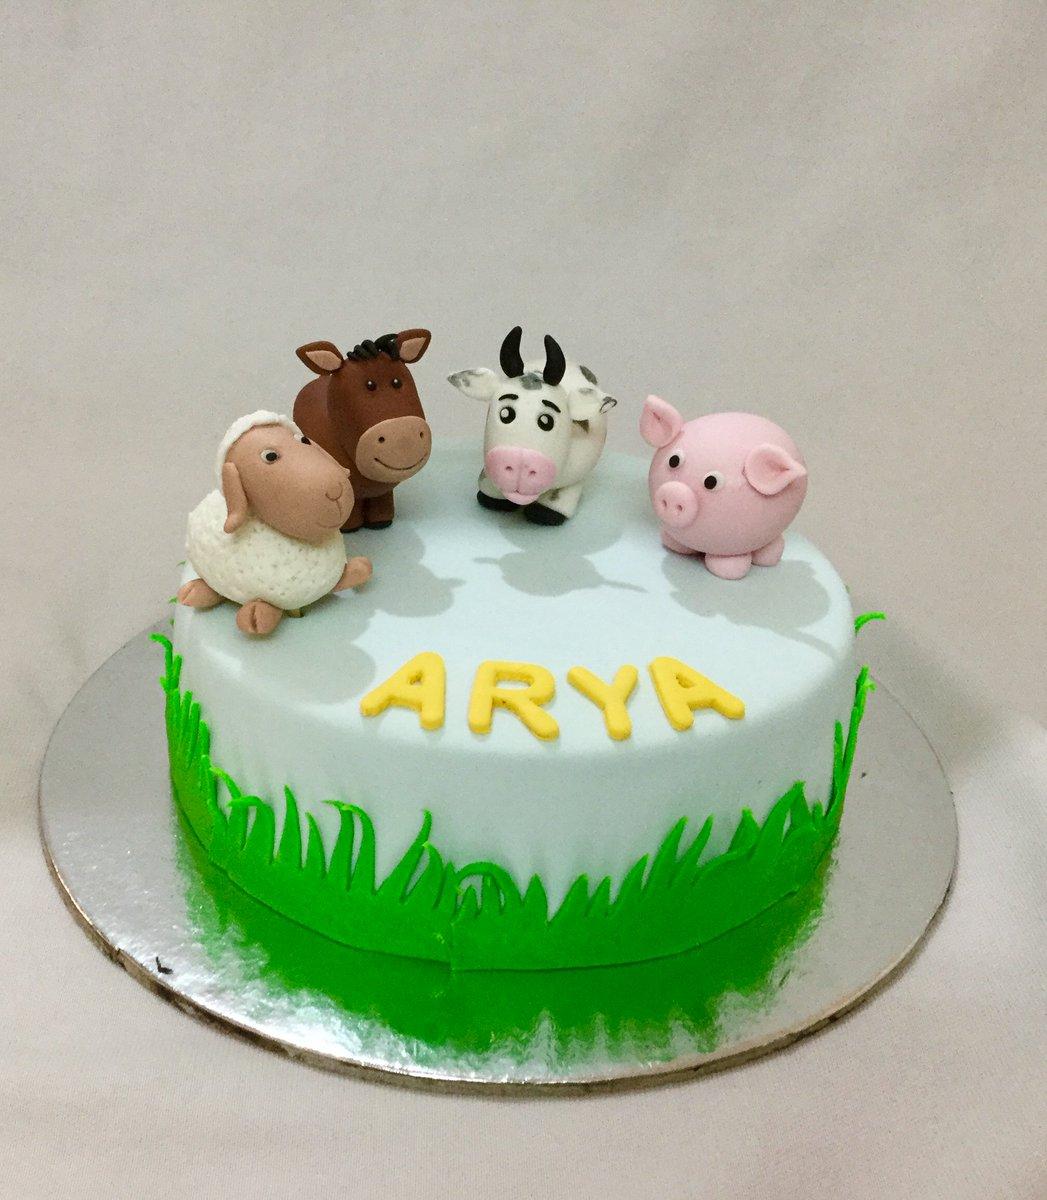 Superb Miras Dial A Cake Sur Twitter Twin Boy And Girl Om And Arya Funny Birthday Cards Online Inifodamsfinfo